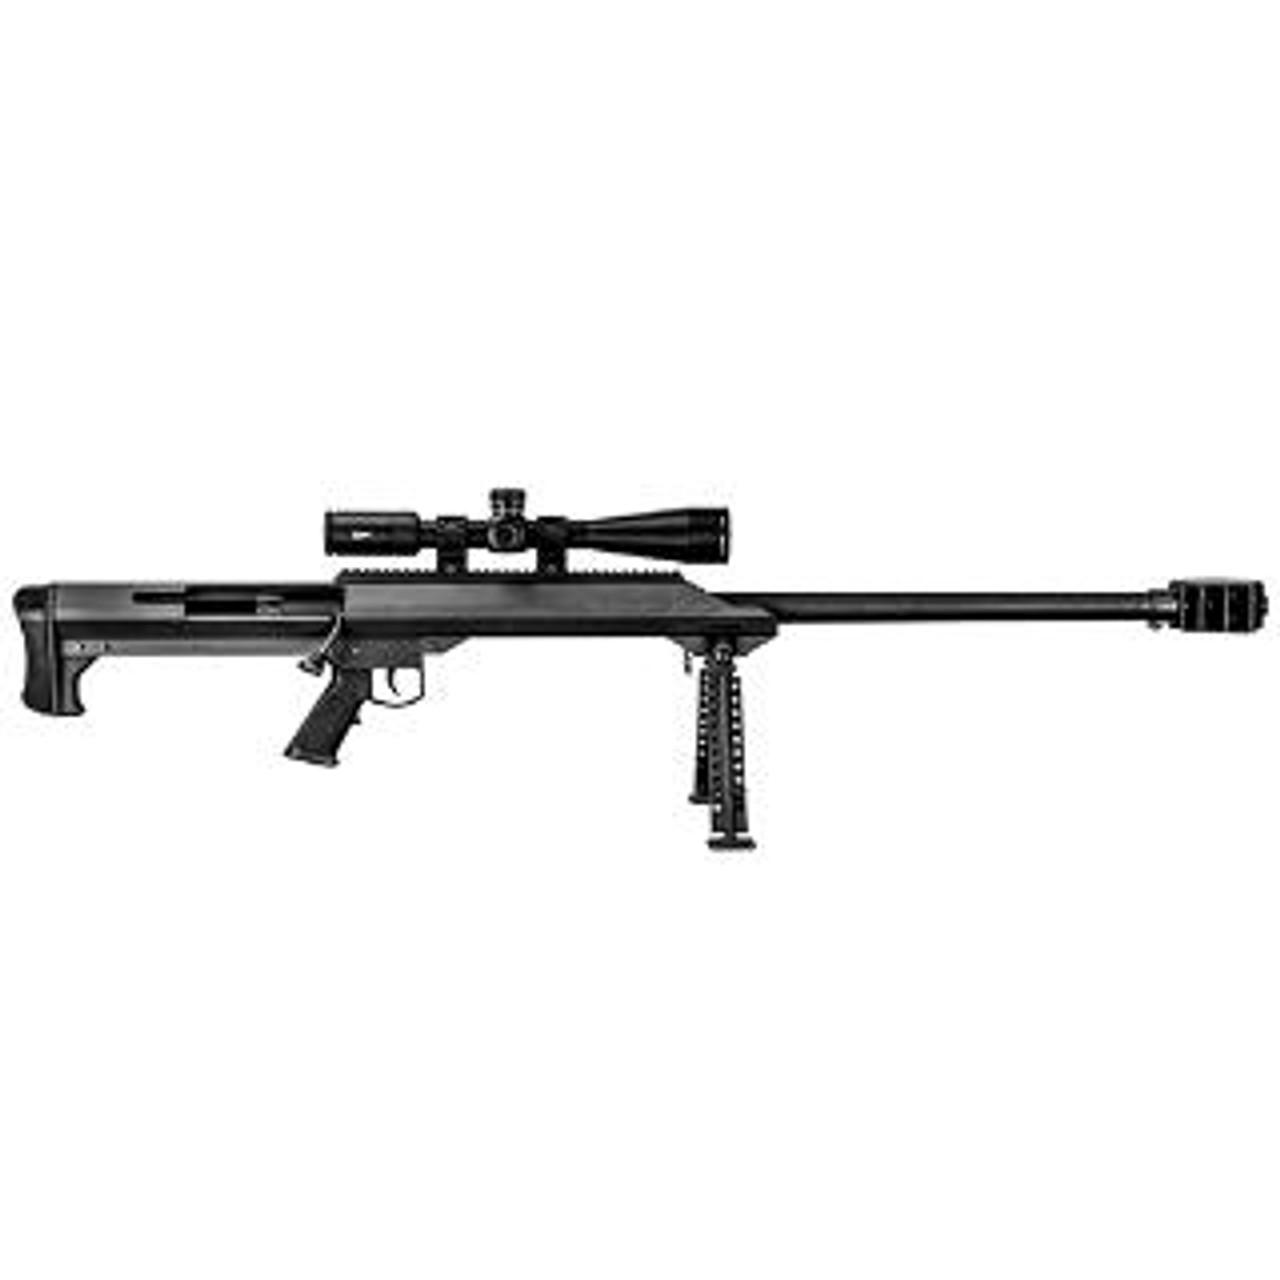 "Barrett M99 32"" Vortex 5-25x56 Viper CALIFORNIA LEGAL - .416"